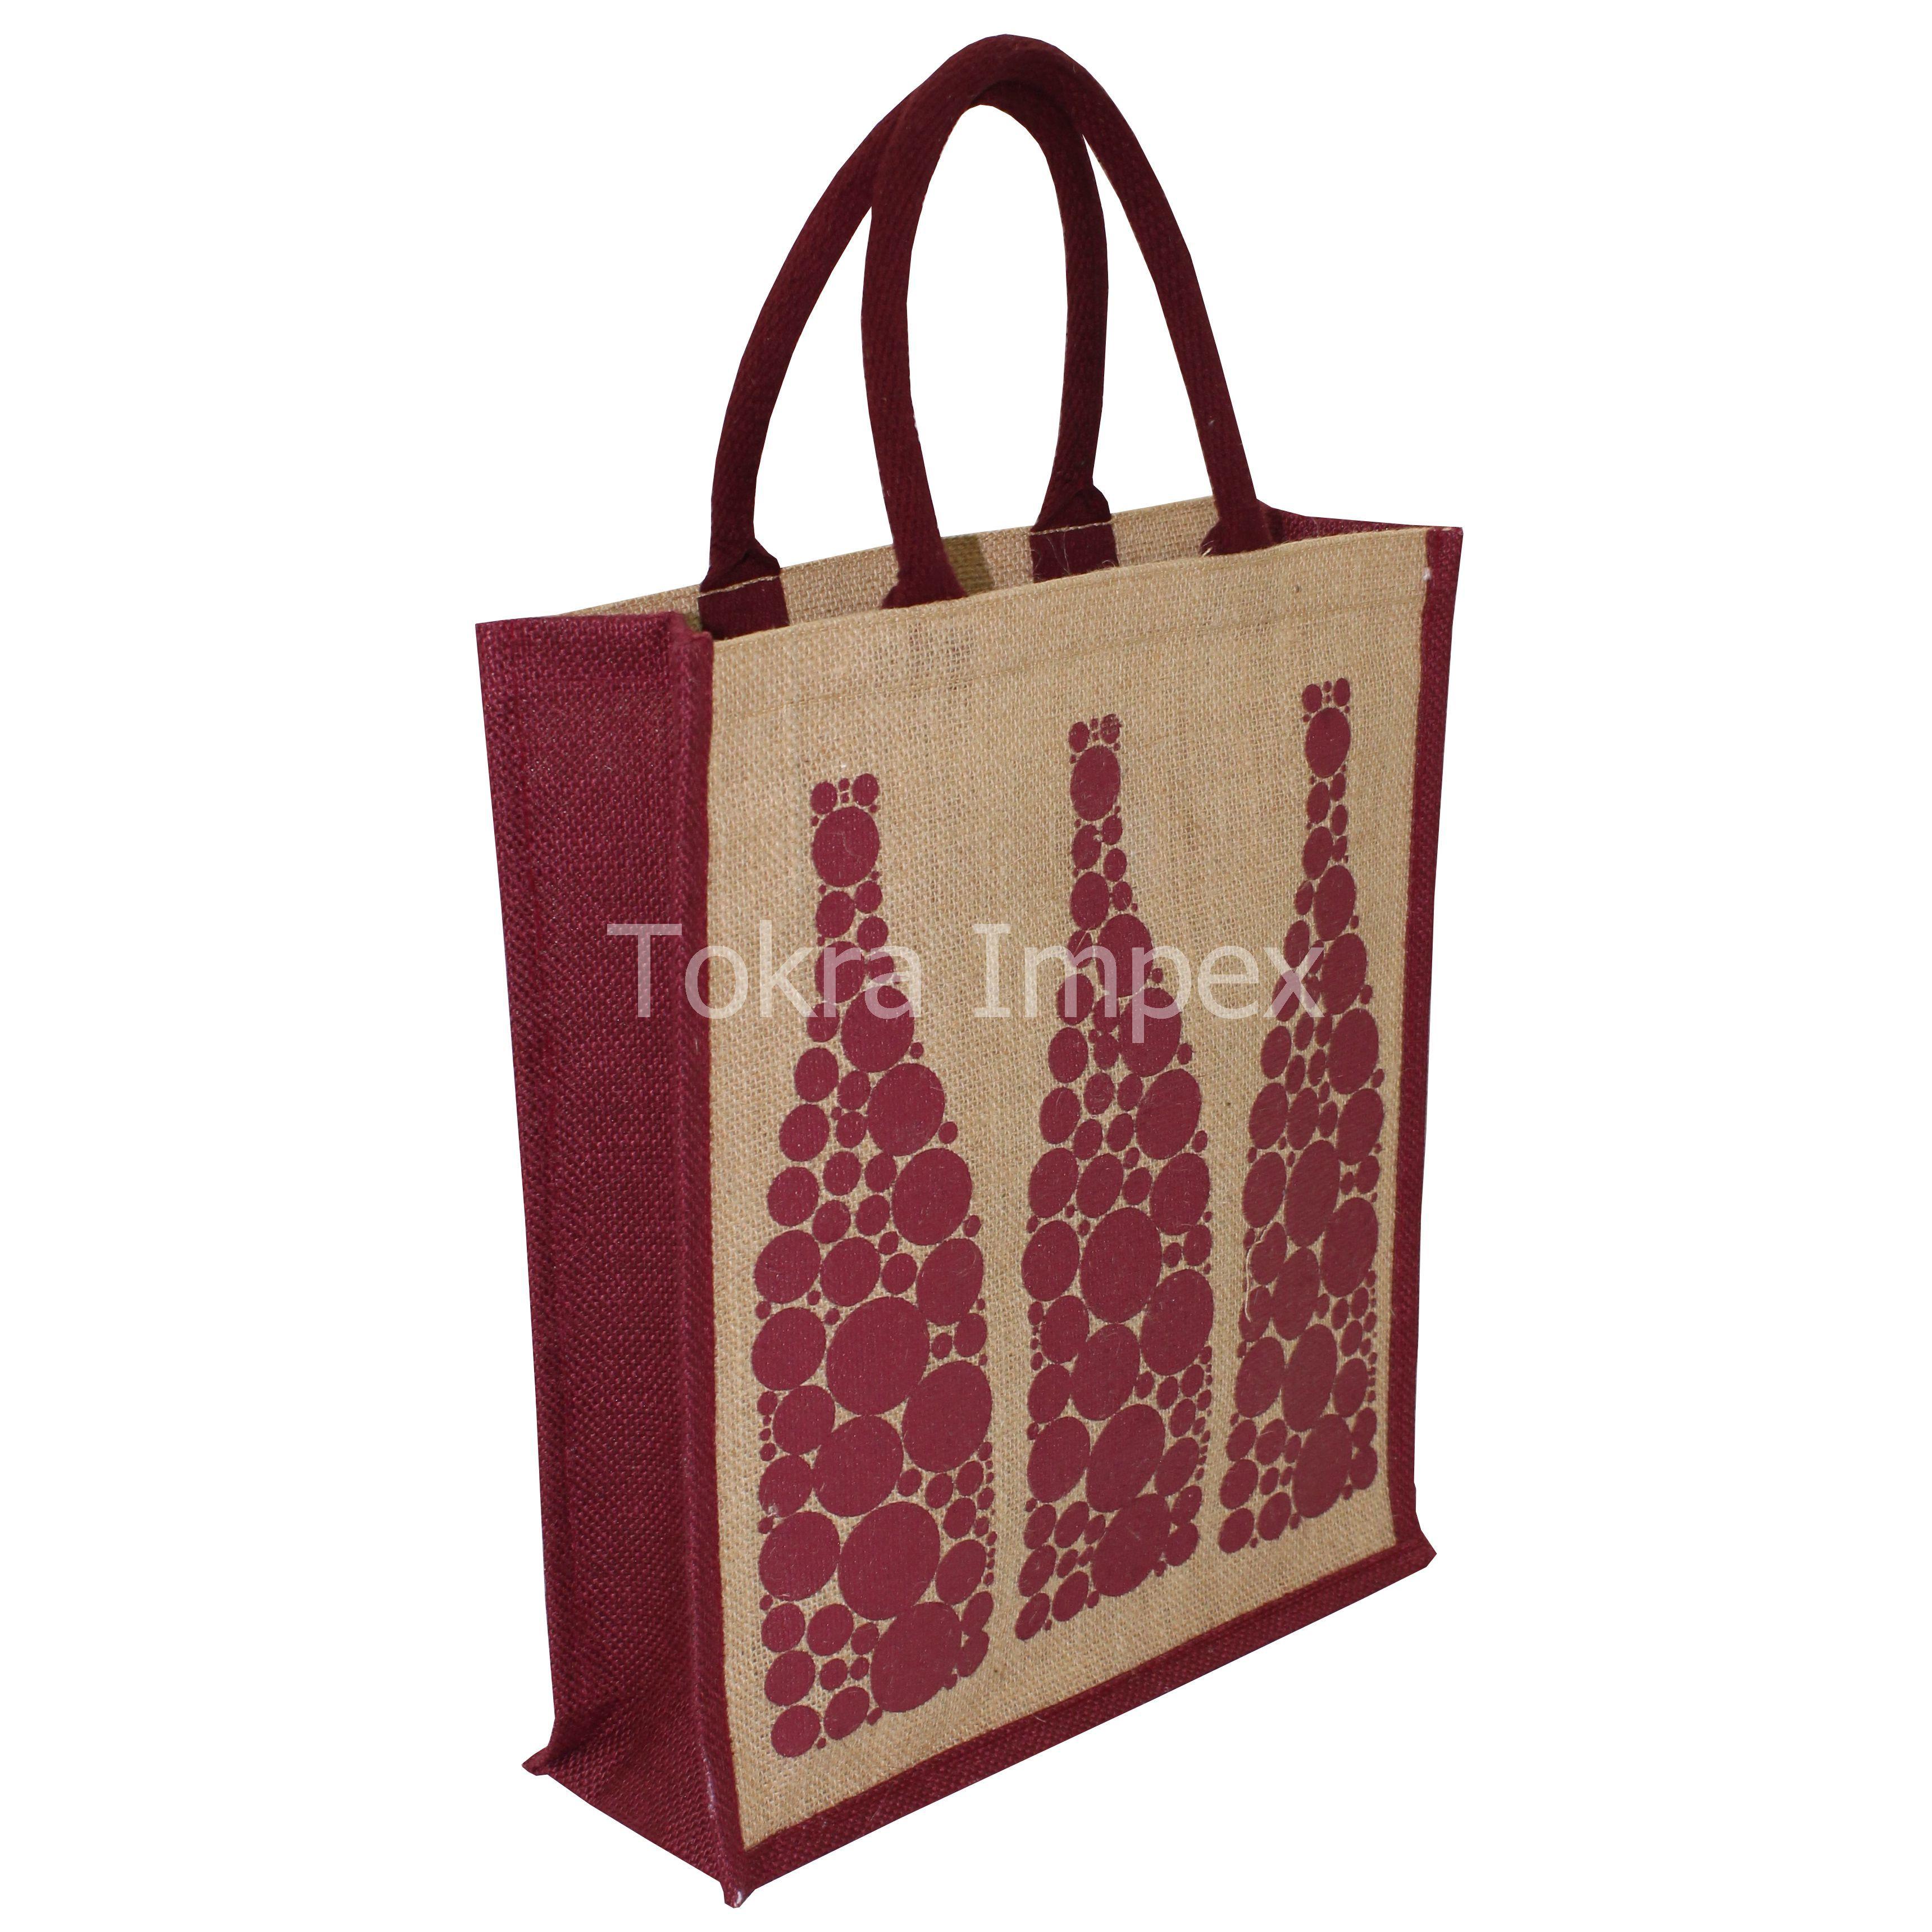 PP Laminated jute 3 Bottle Bag for Promotion & Gift